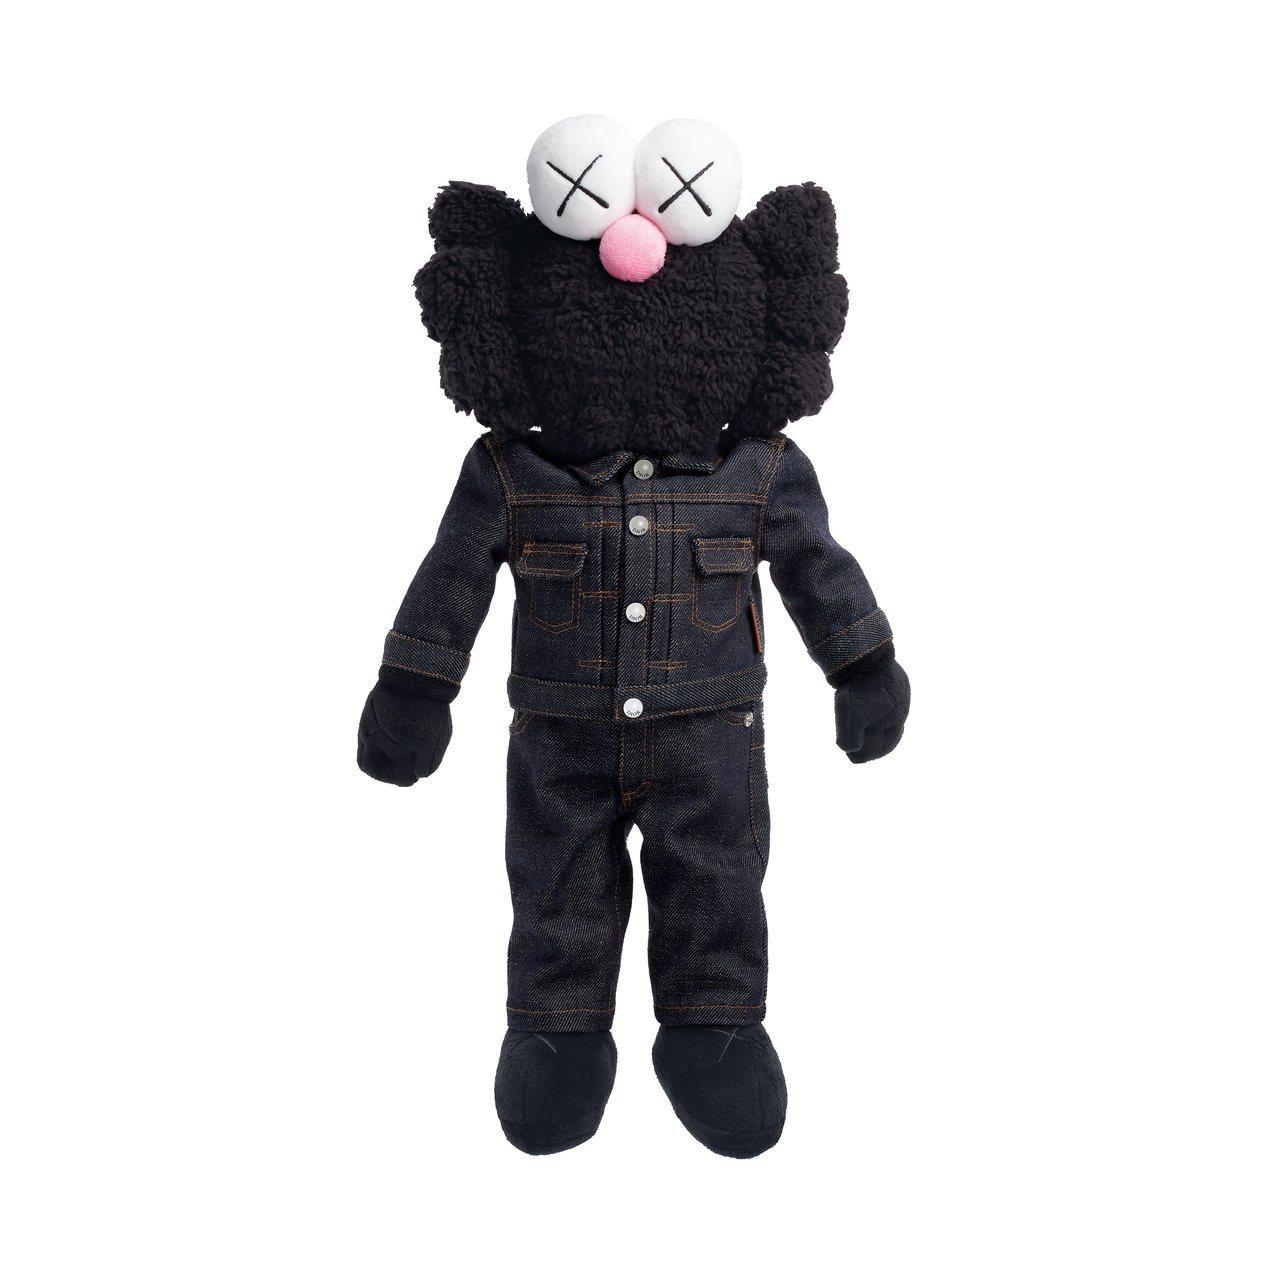 DIOR X KAWS合作玩偶的黑色版本。圖/DIOR提供